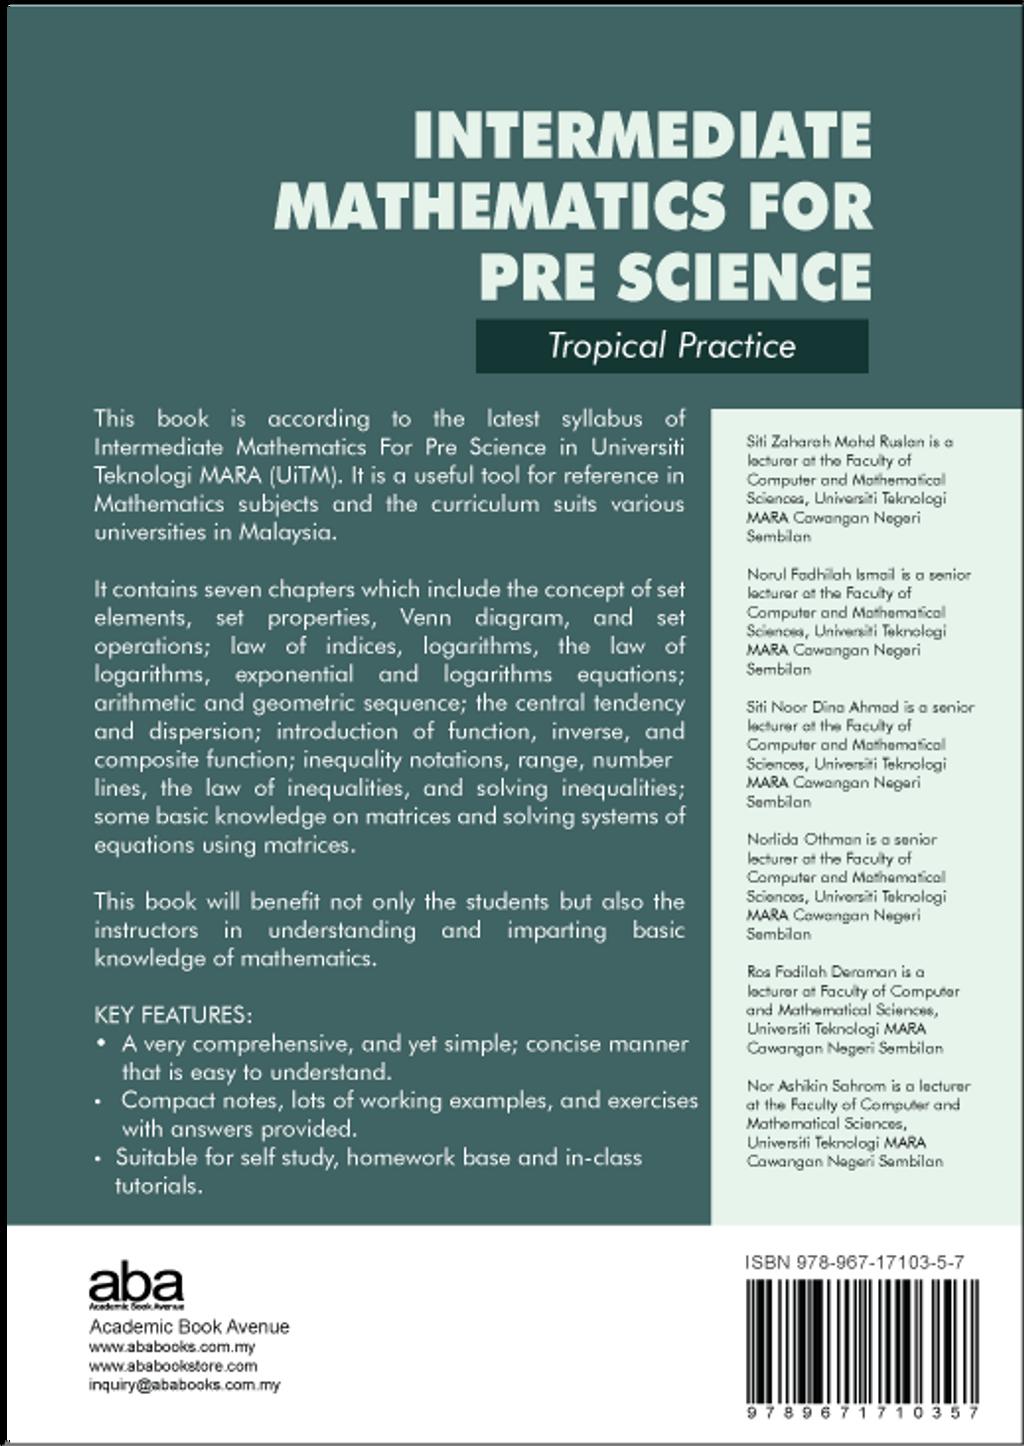 Intermediate-Mathematics-Cover_04.png